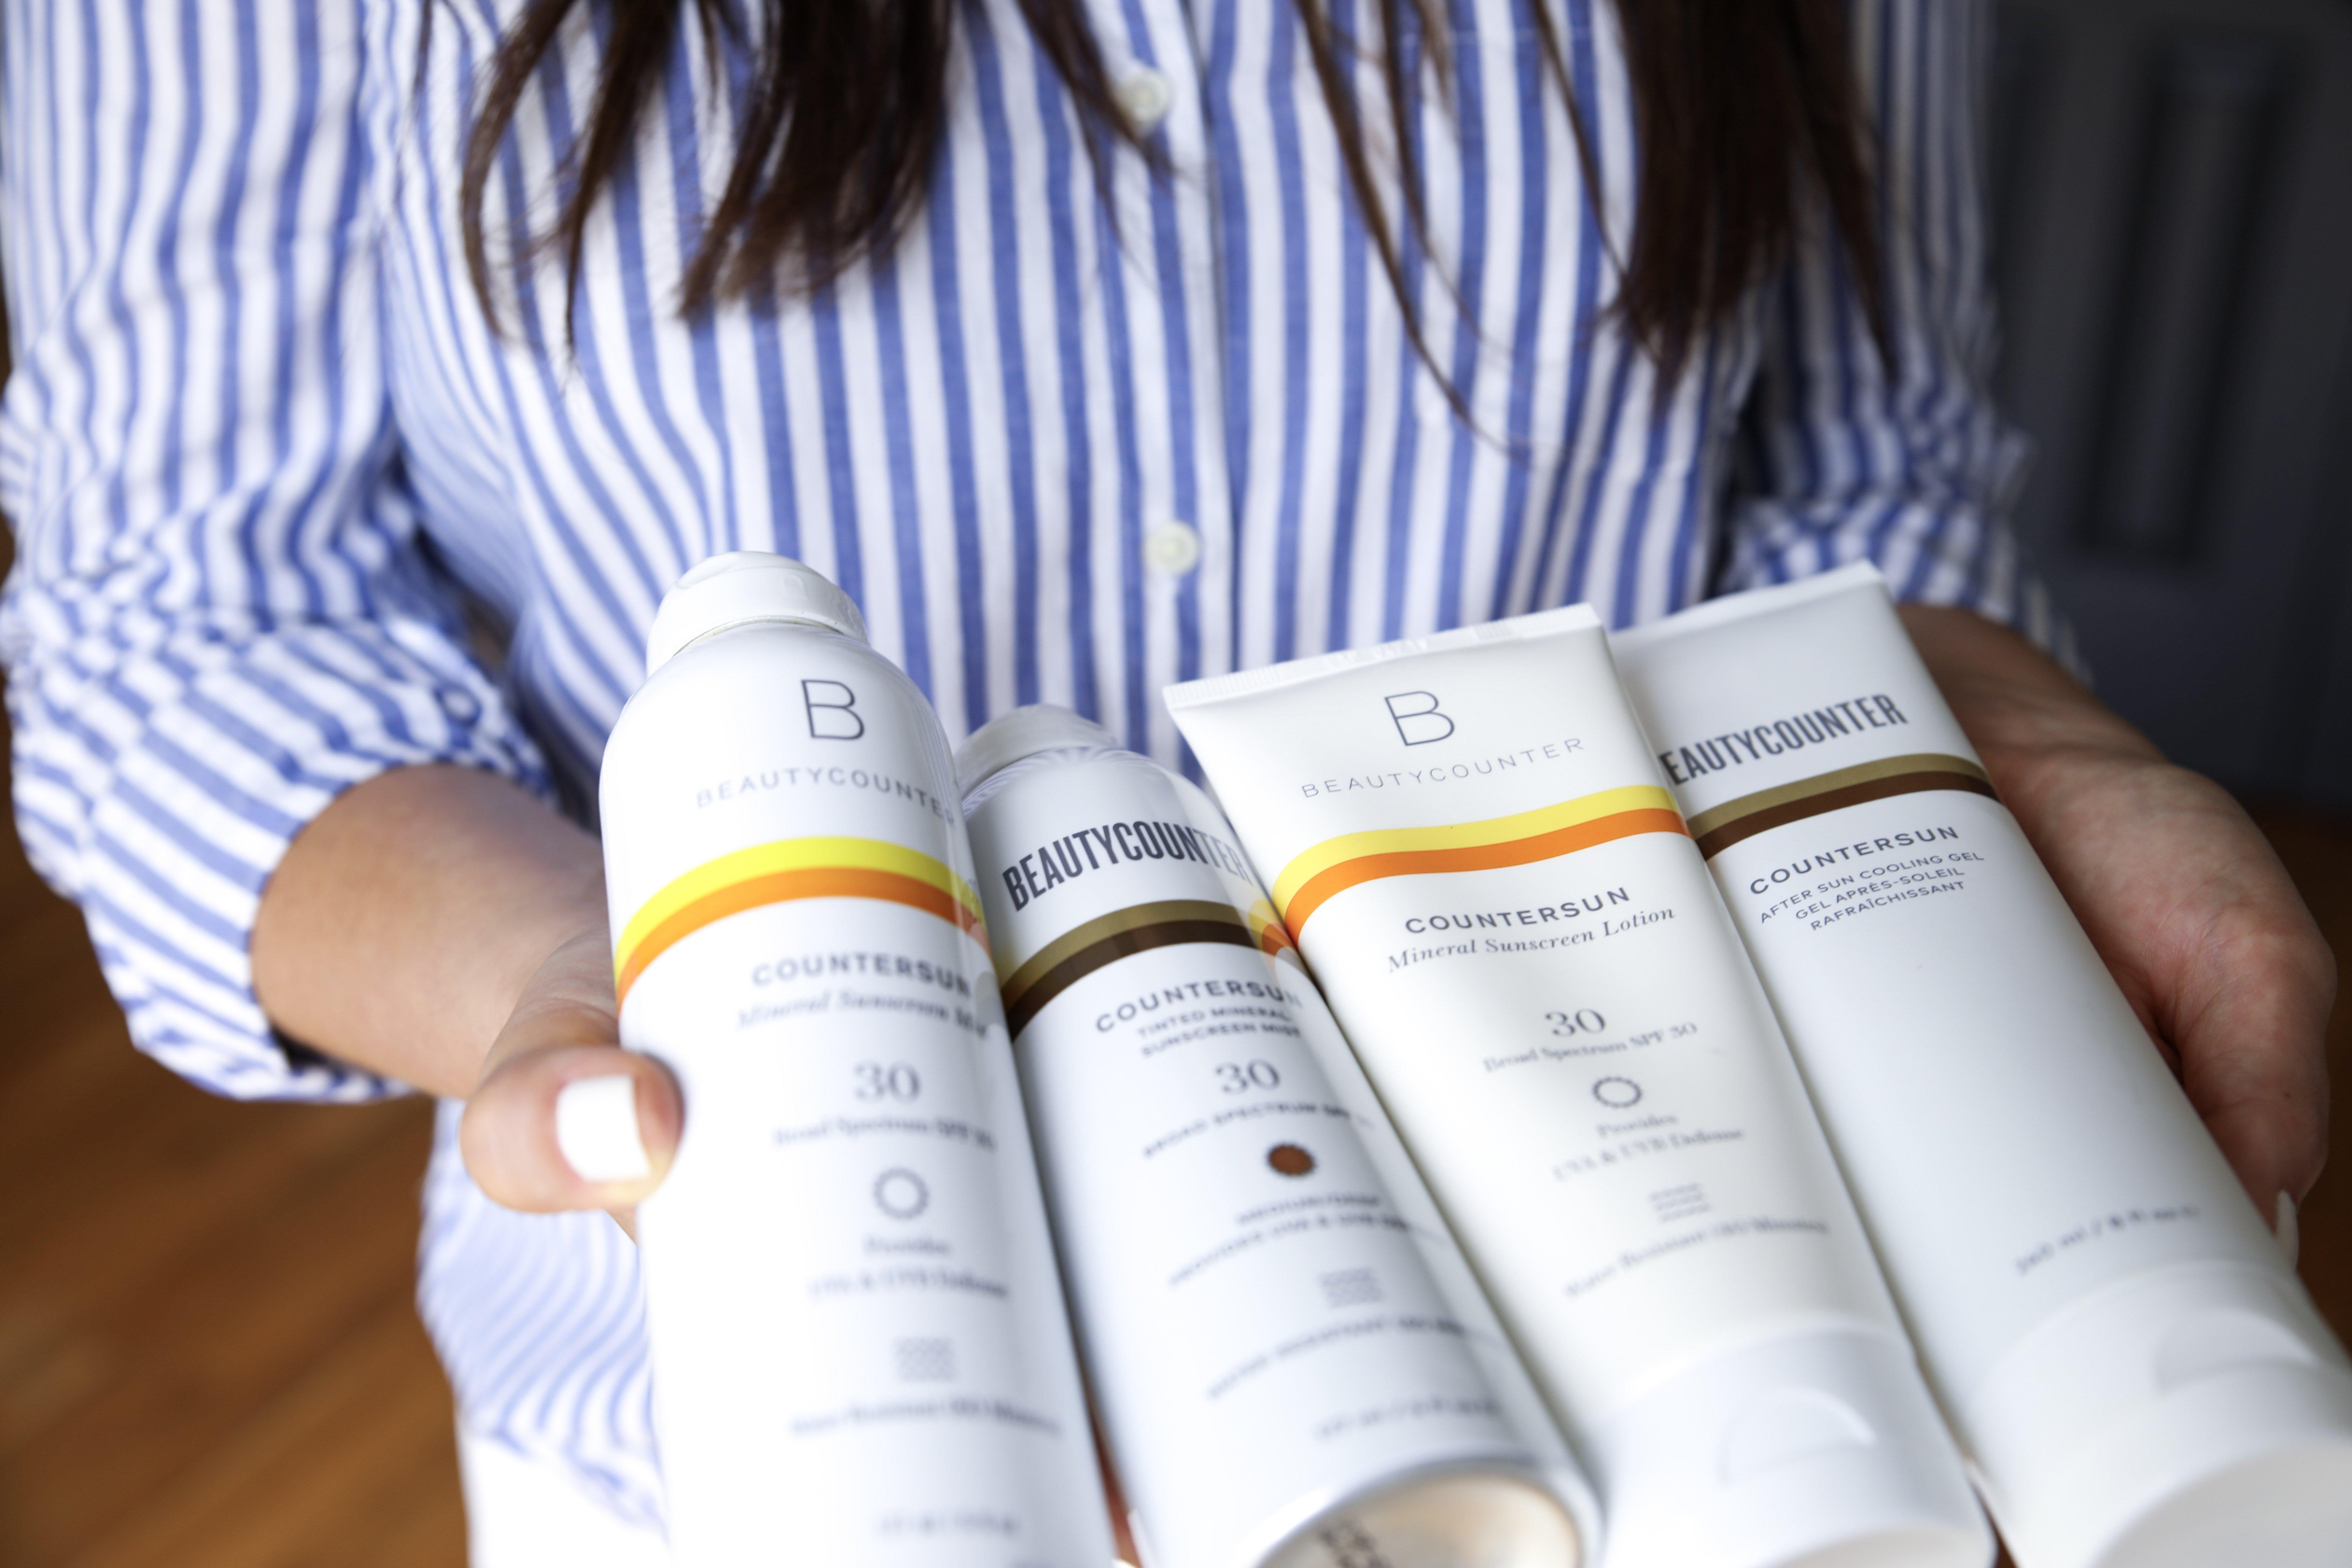 Image of sarah bridgeman holding sunscreen